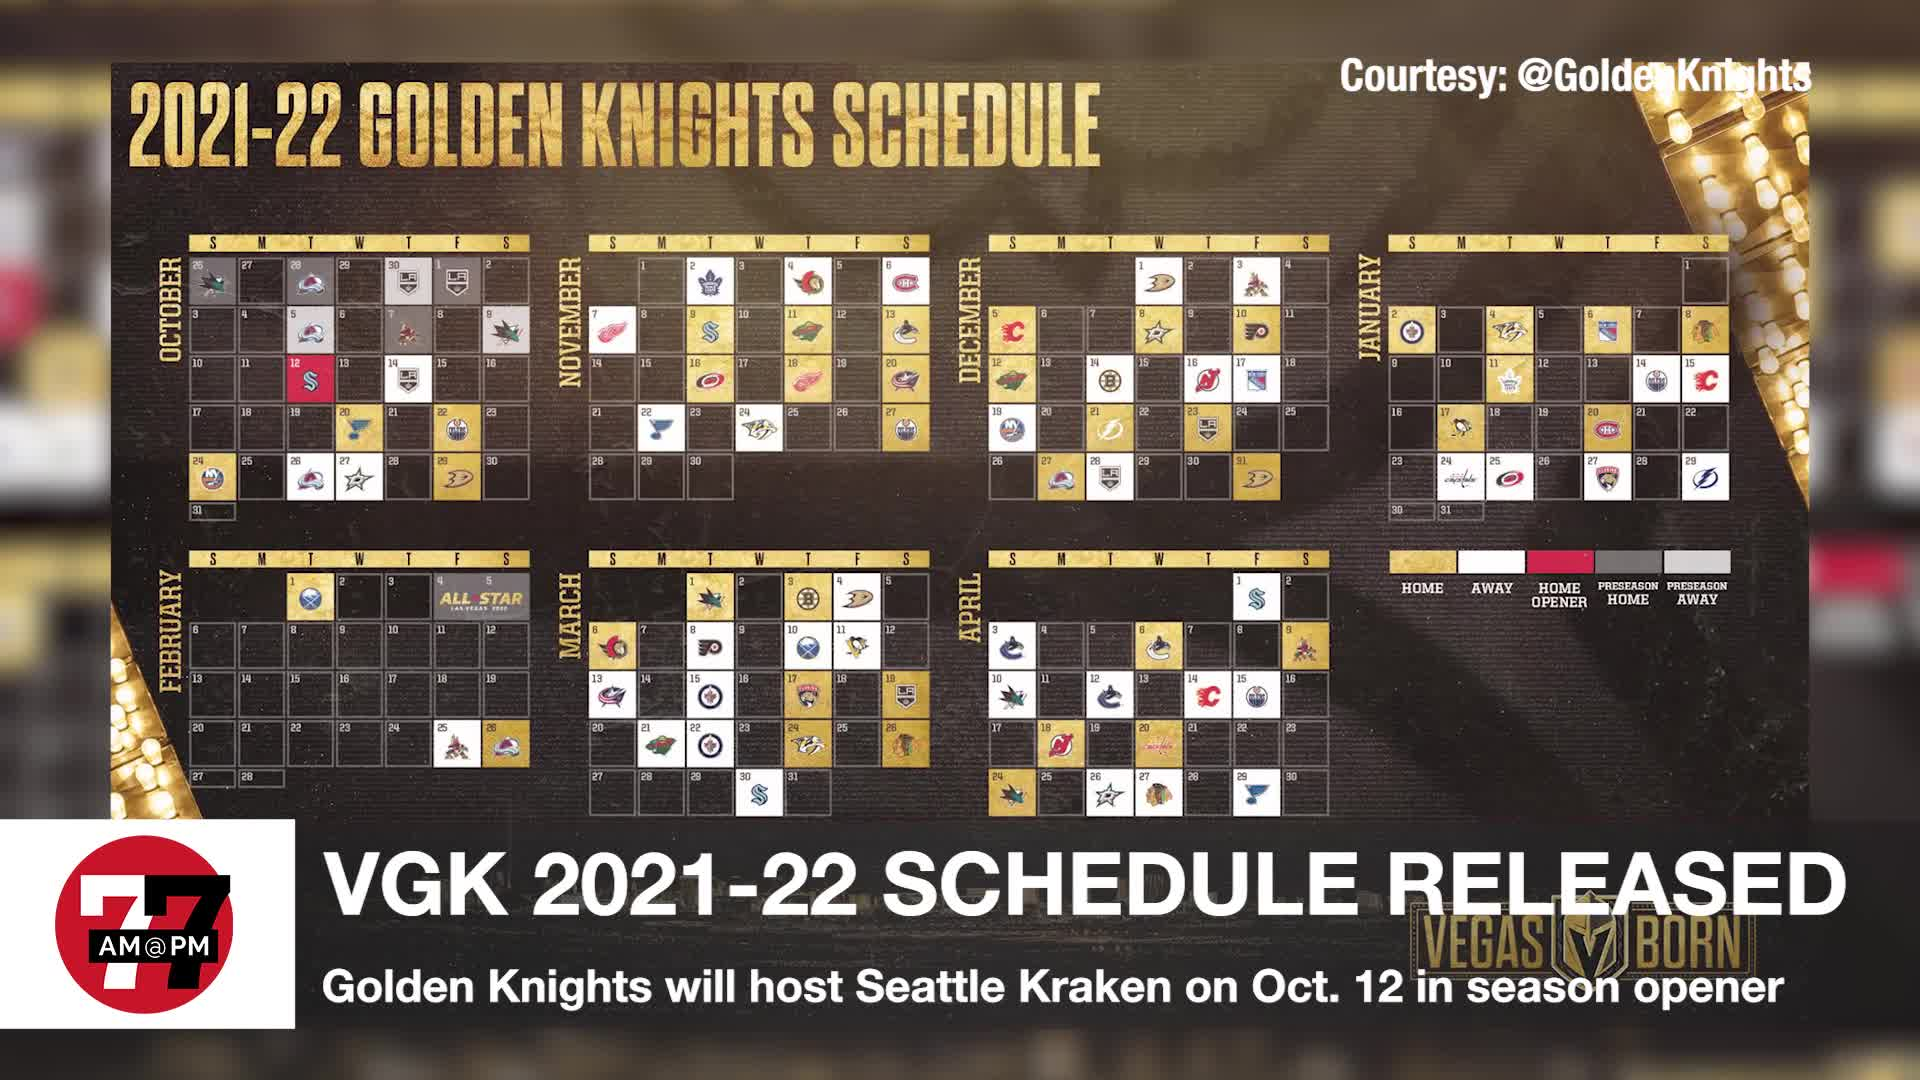 7@7PM VGK 2021-22 Schedule Released